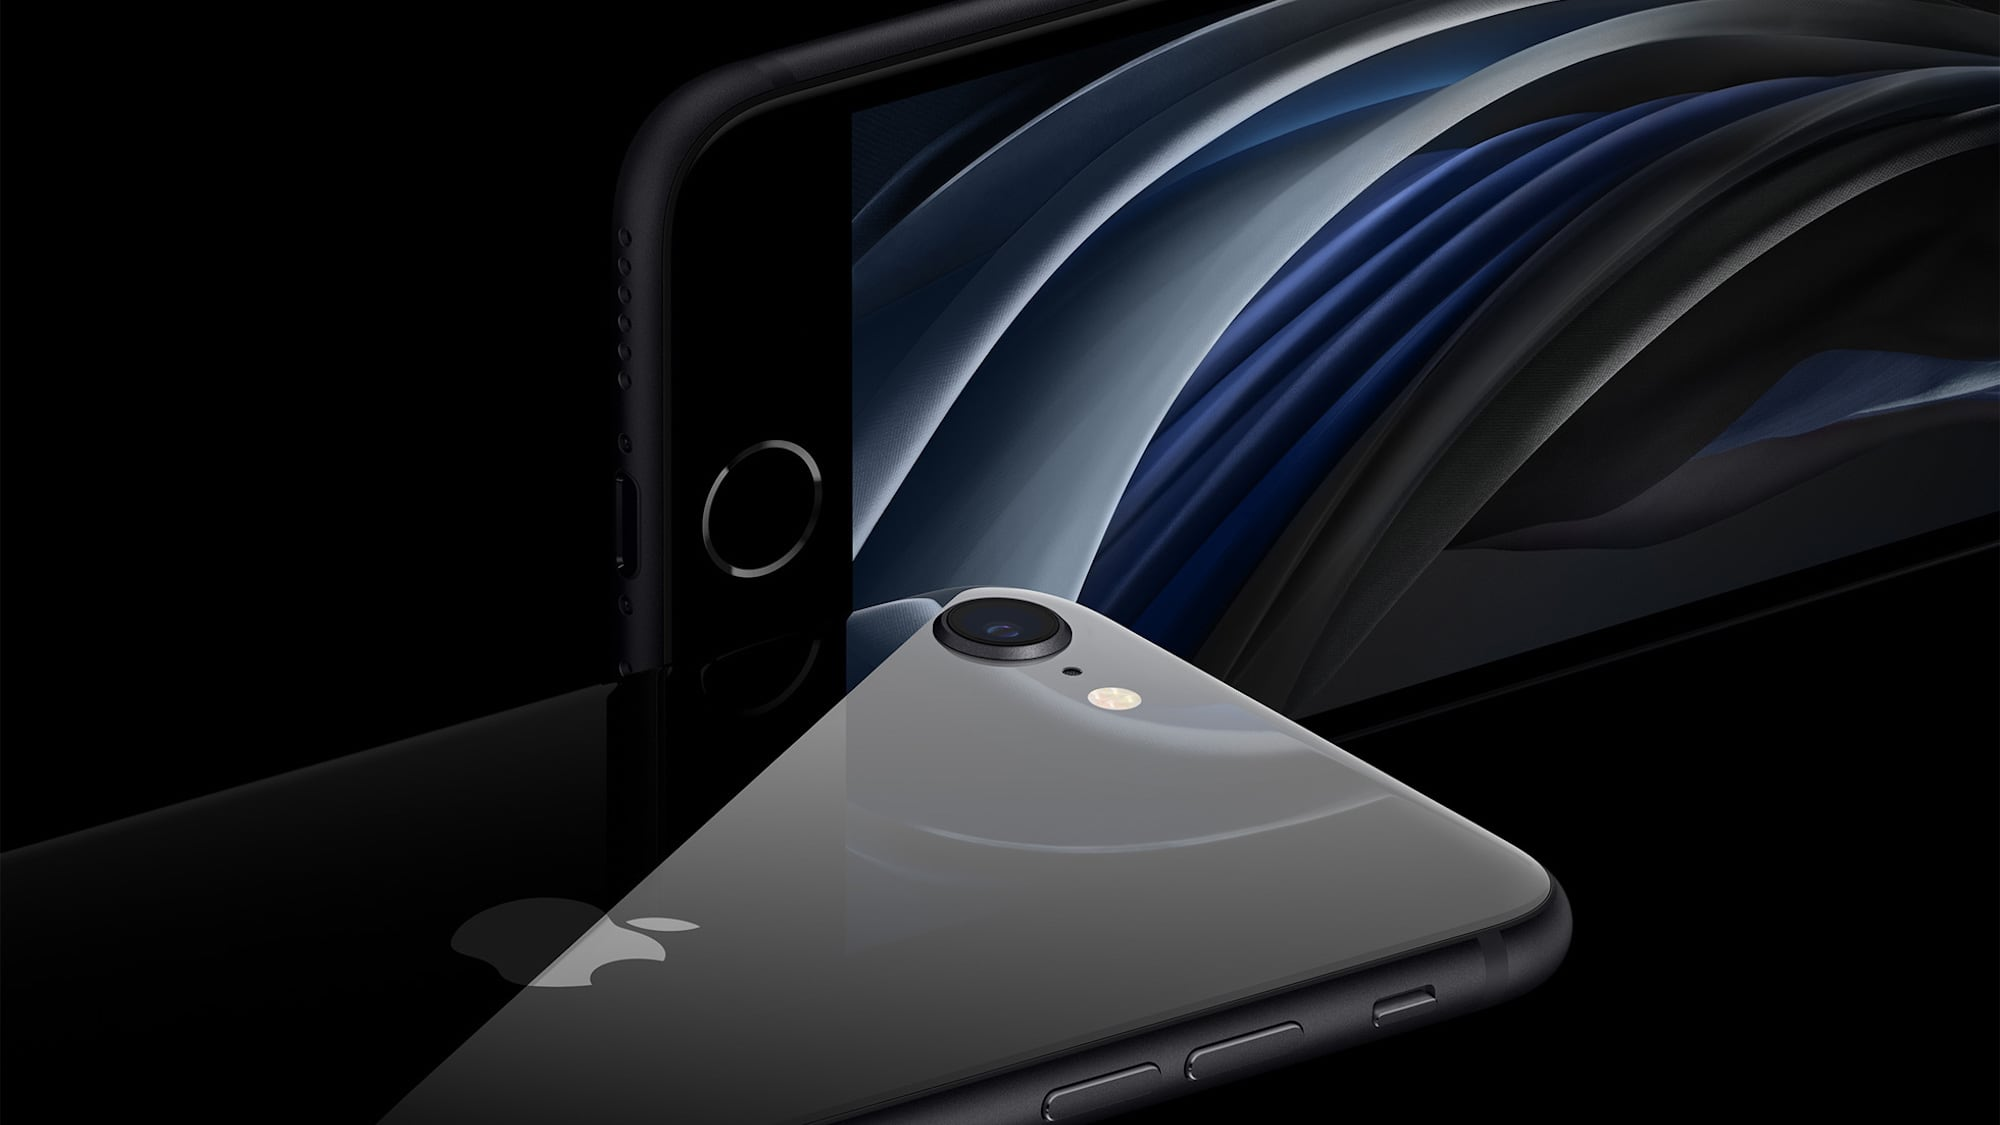 Apple iPhone SE 2nd Generation Single-Camera Smartphone